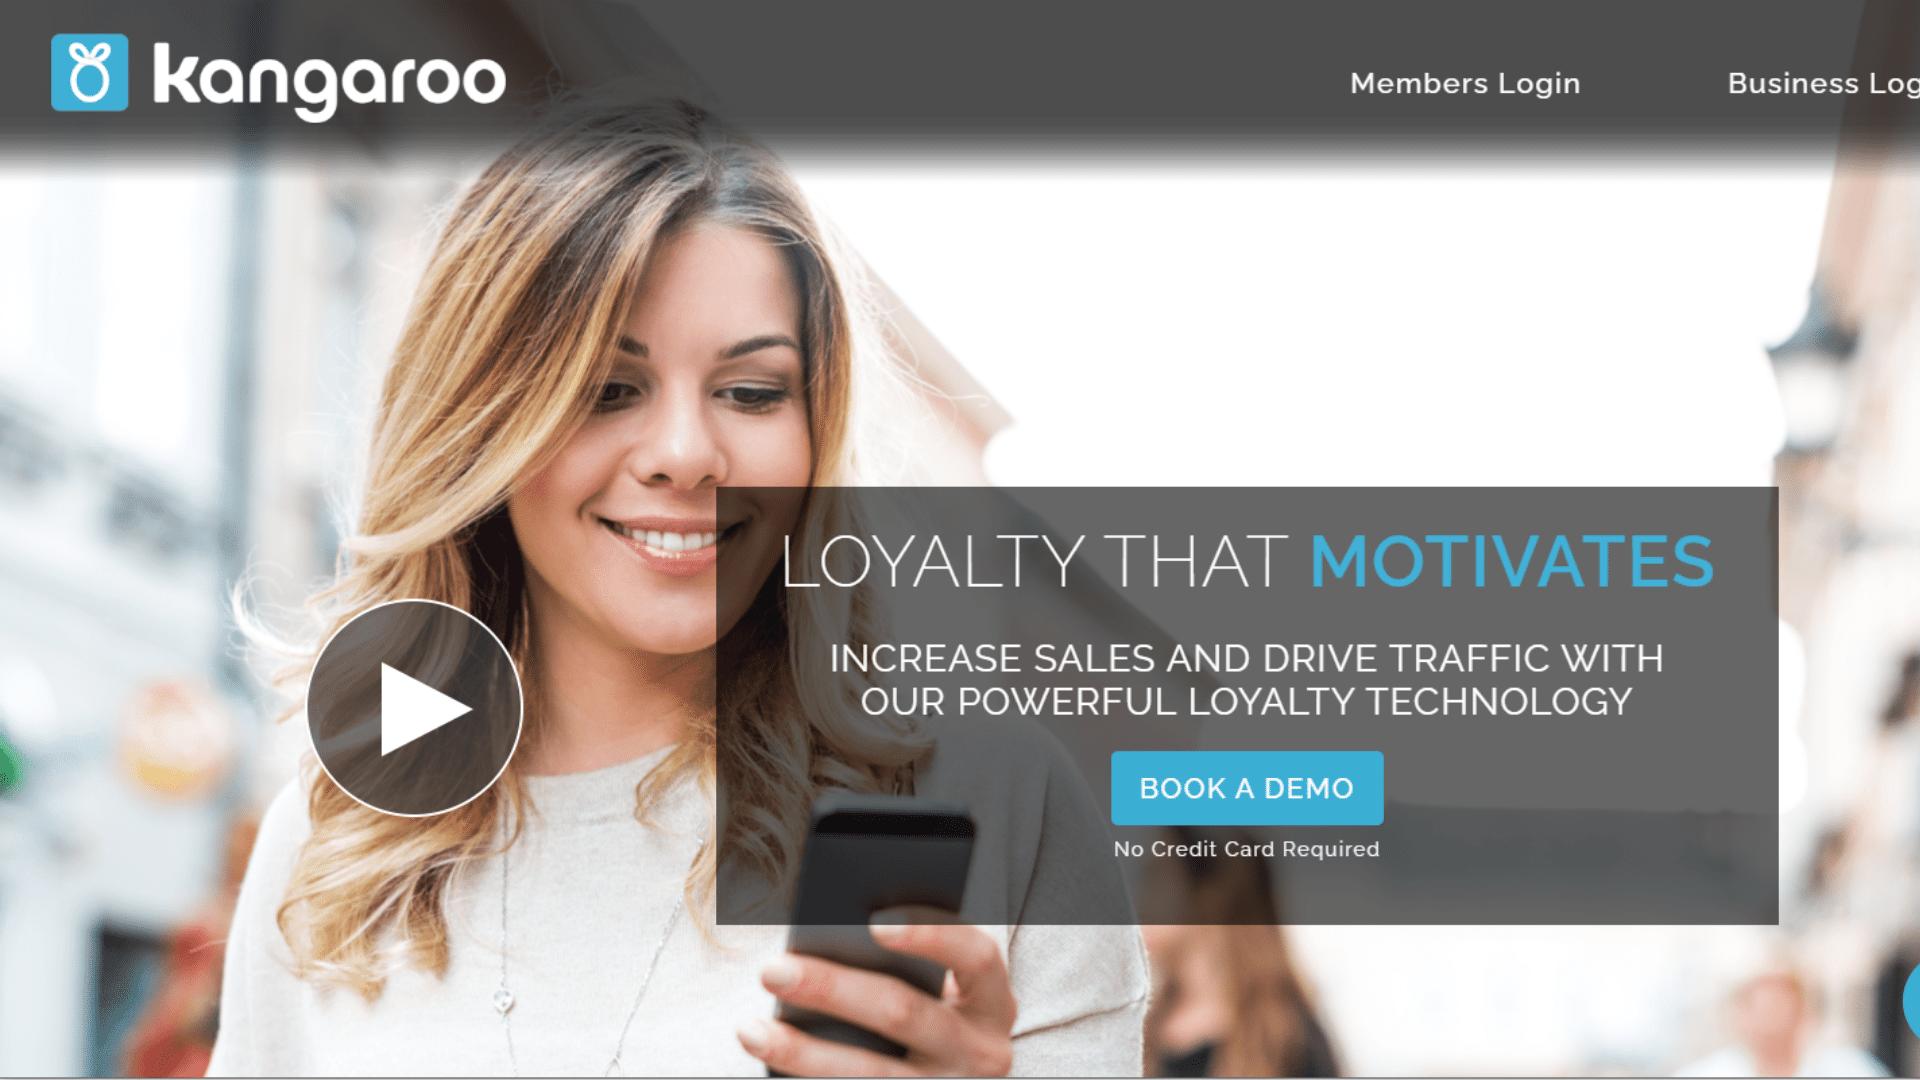 kangarro customer loyalty software